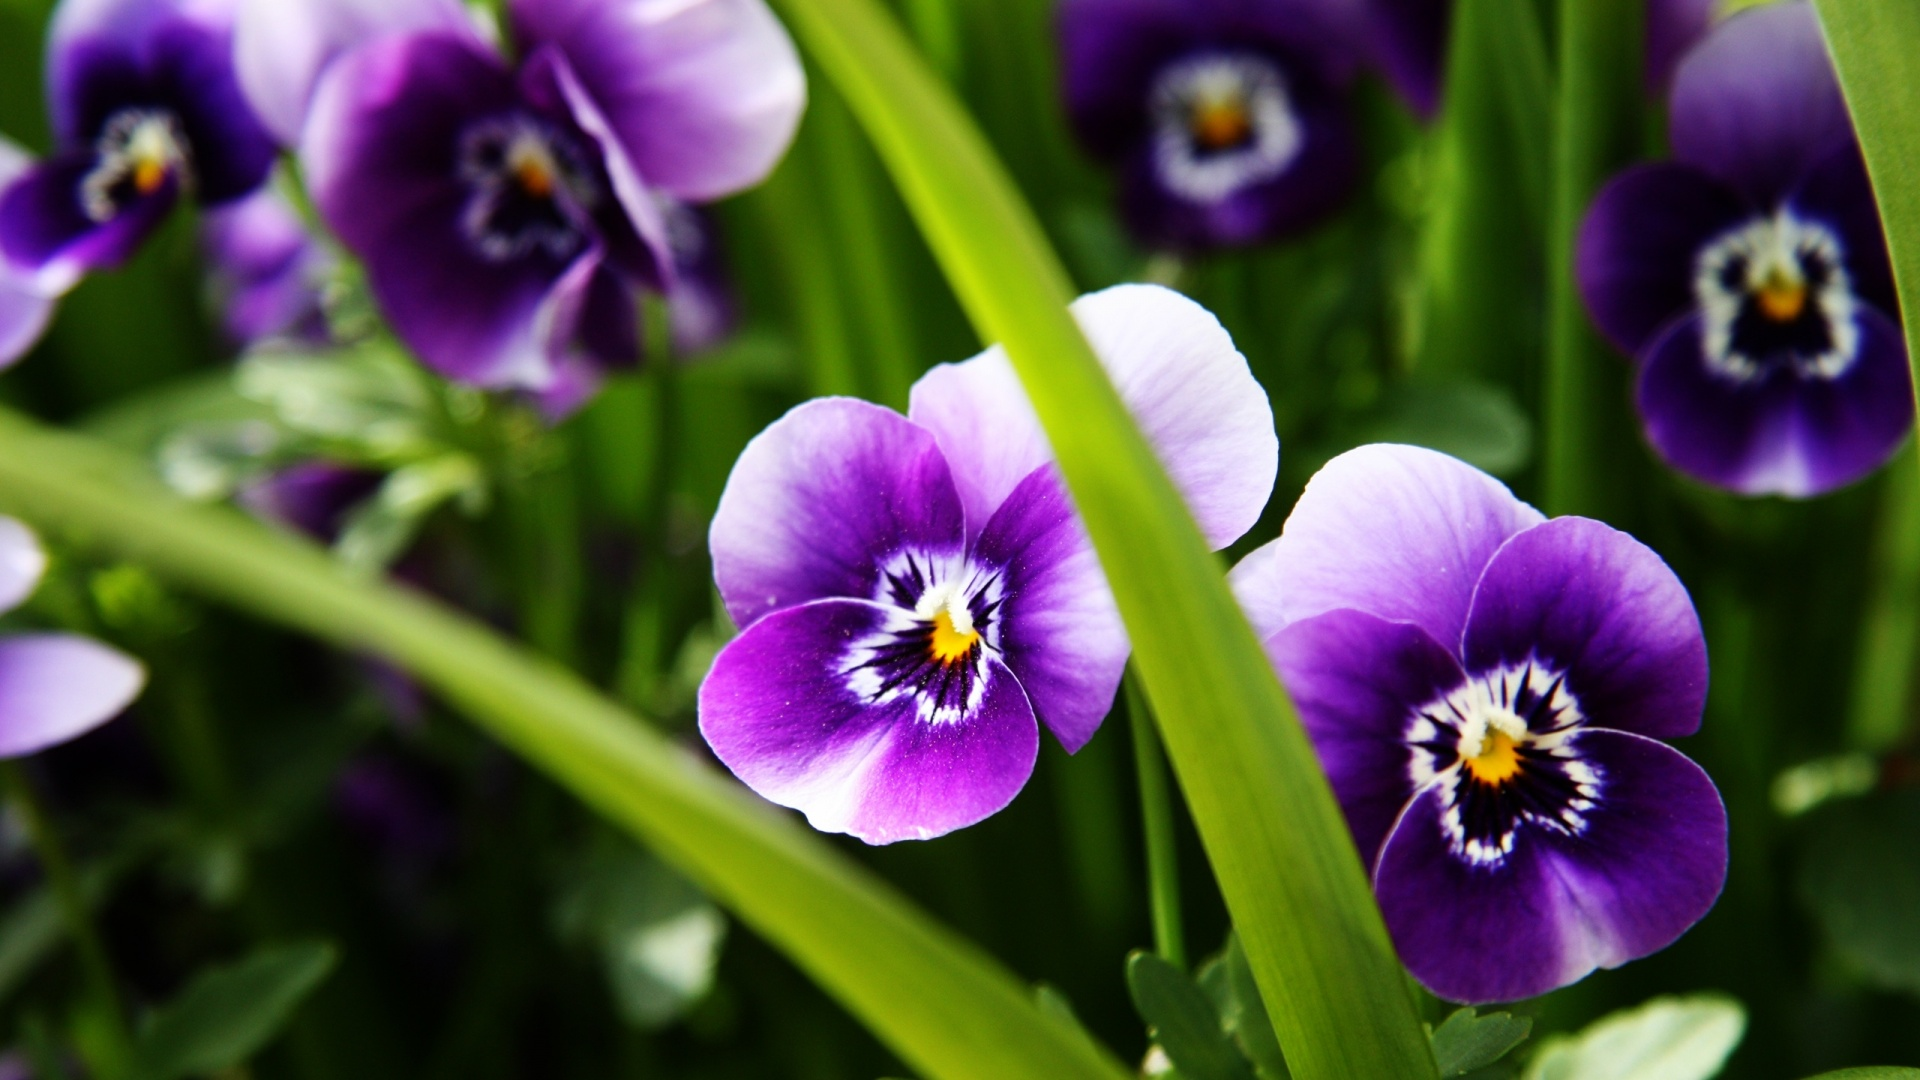 46+ Wallpaper for Desktop Purple Flowers on WallpaperSafari